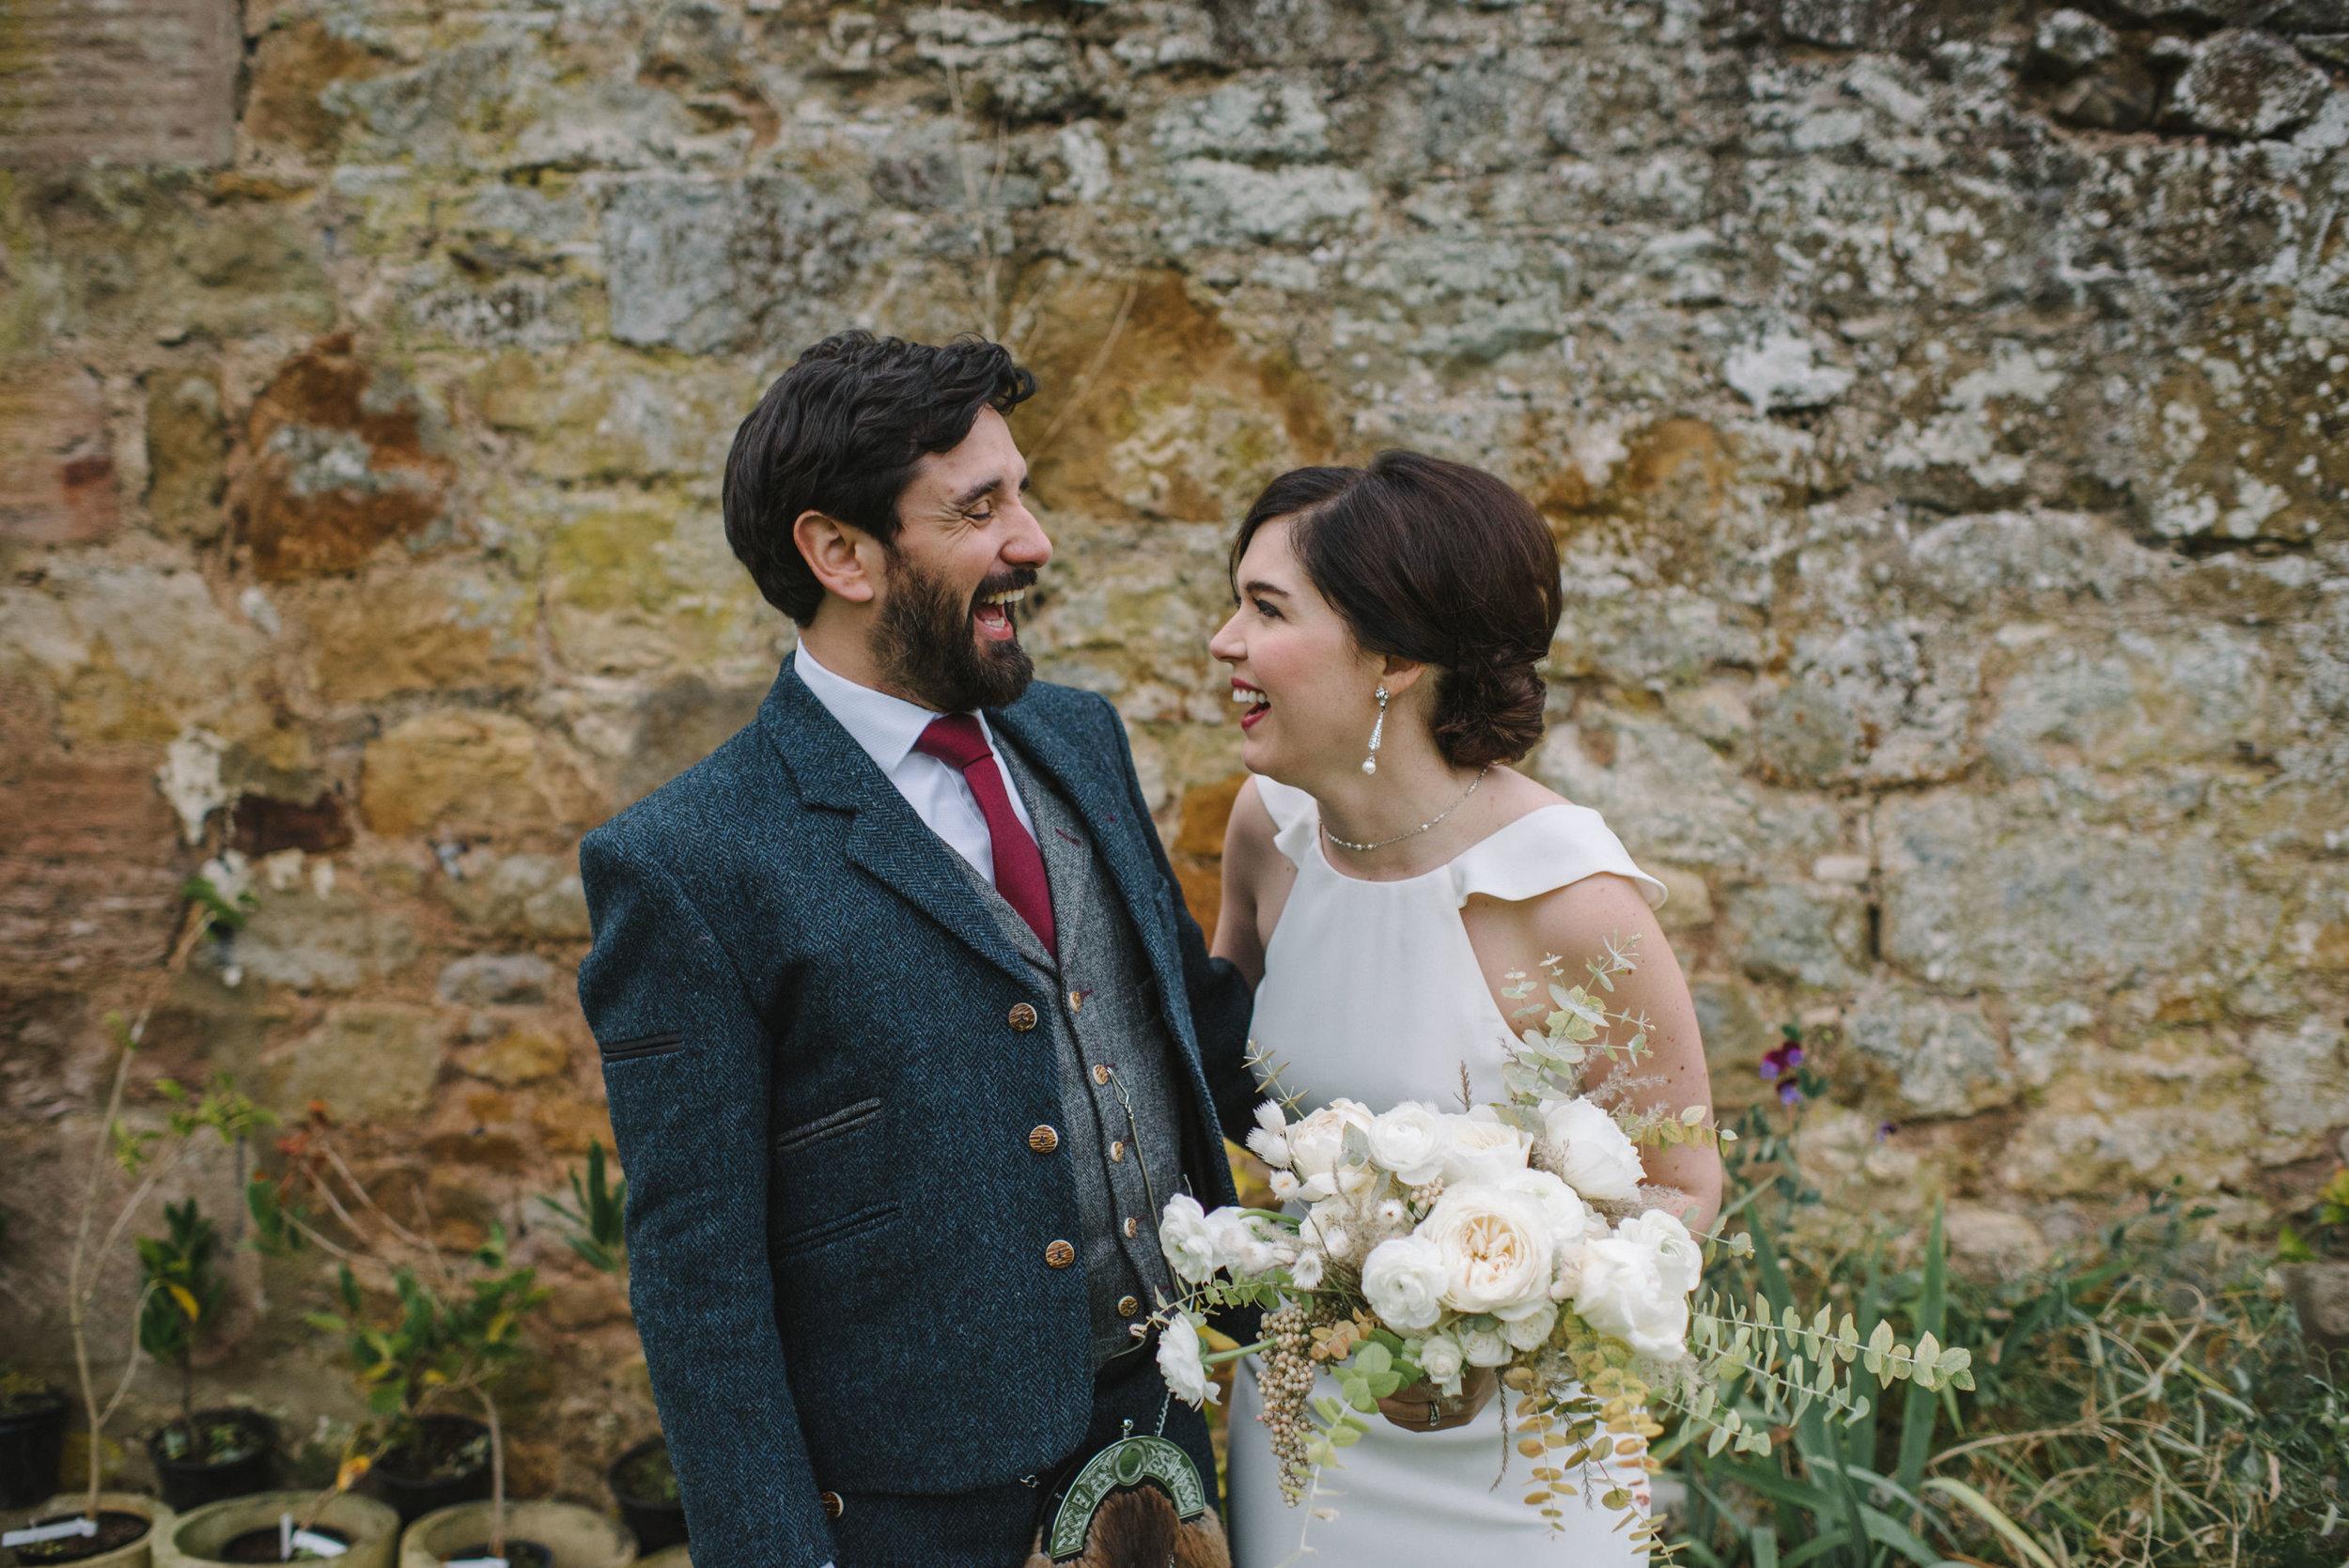 0125-LISA-DEVINE-PHOTOGRAPHY-ALTERNATIVE-WEDDING-PHOTOGRAPHY-SCOTLAND-DESTINATION-WEDDINGS-GLASGOW-WEDDINGS-COOL-WEDDINGS-STYLISH-WEDDINGS.JPG